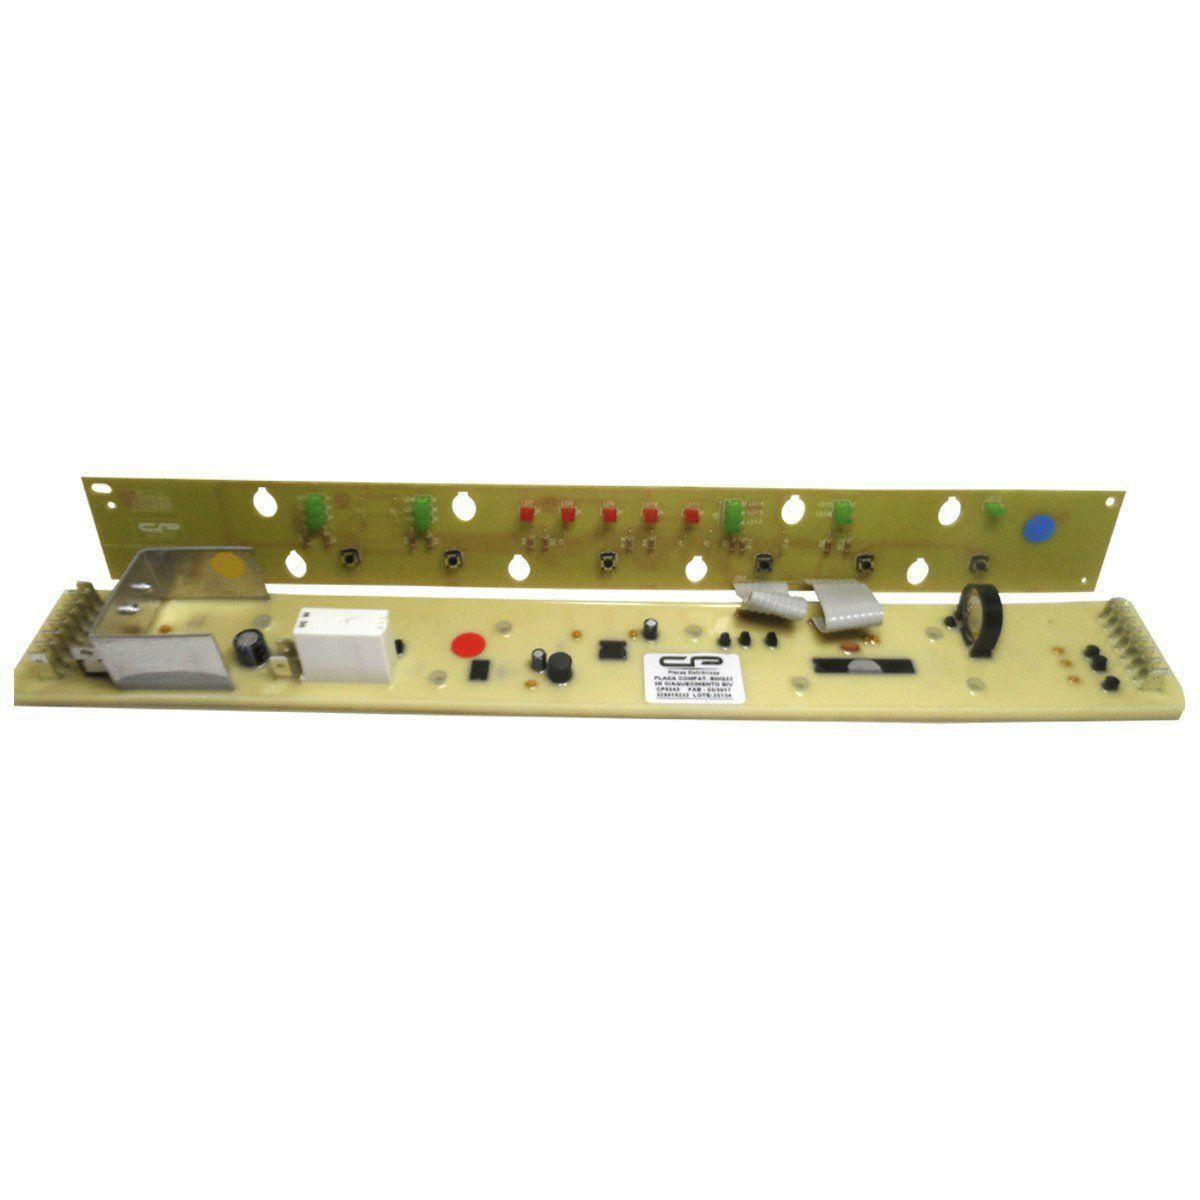 Placa Eletrônica Potência e Interface Lavadora Brastemp